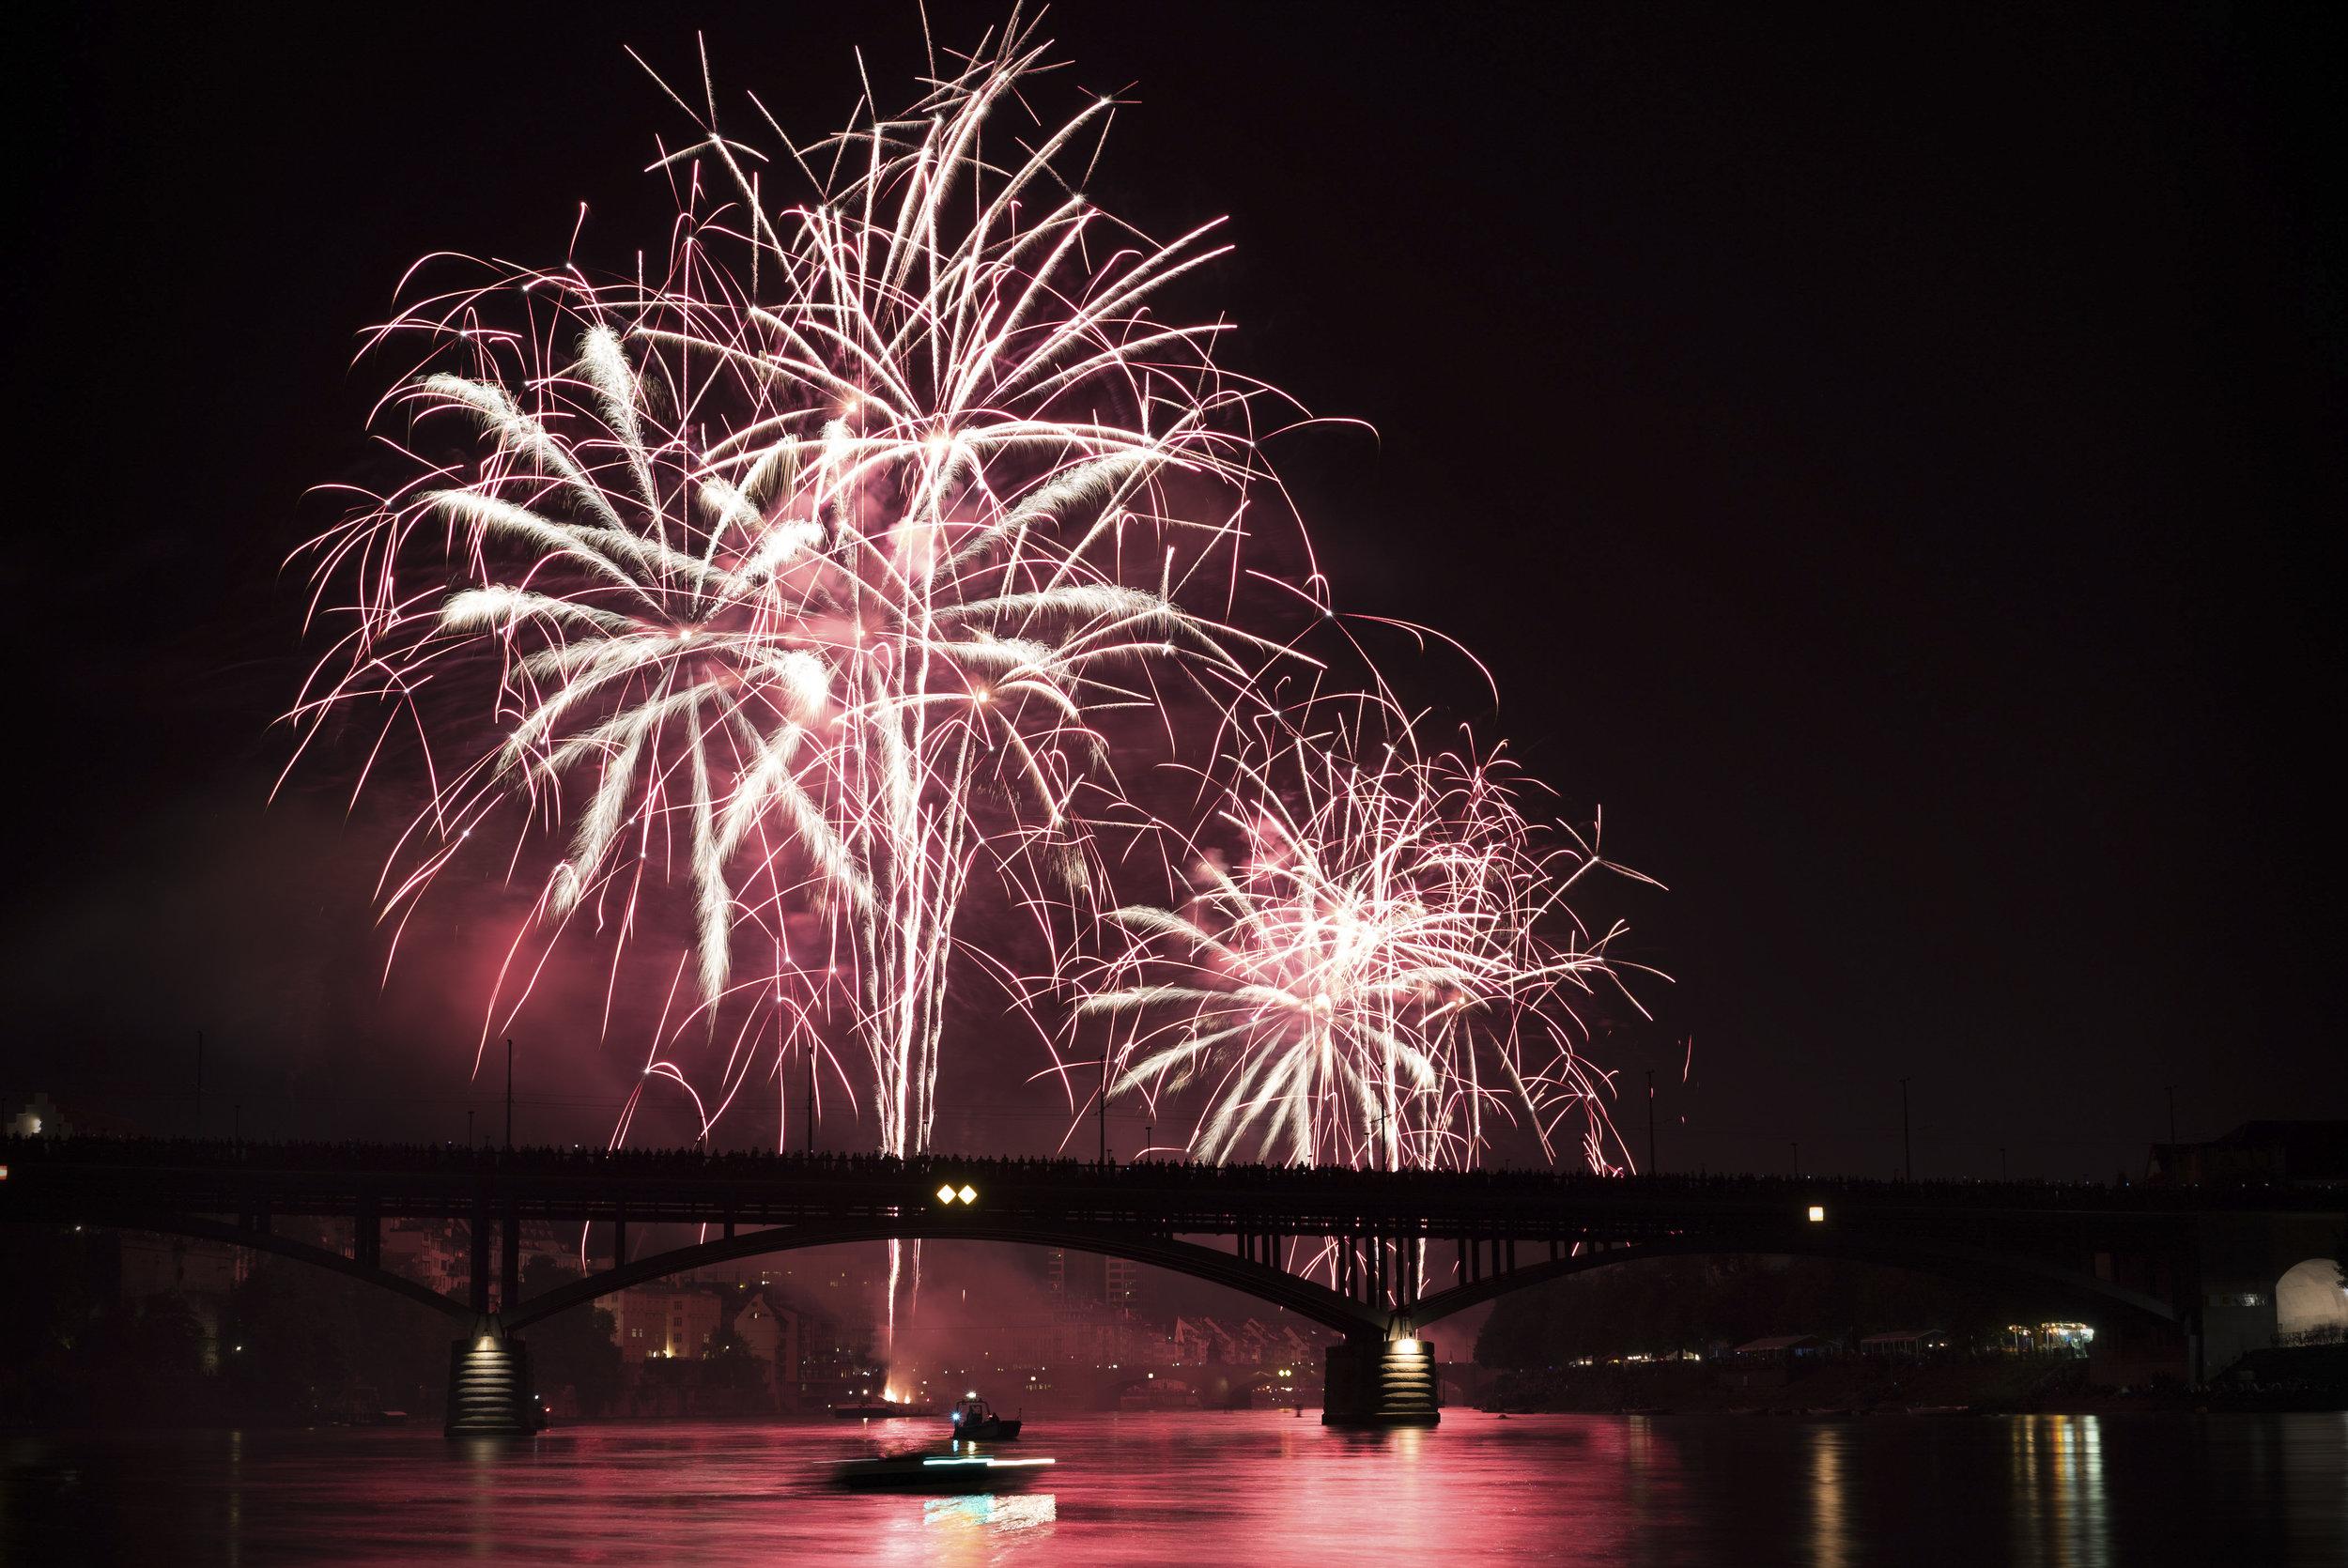 Basel fireworks - Switzerland